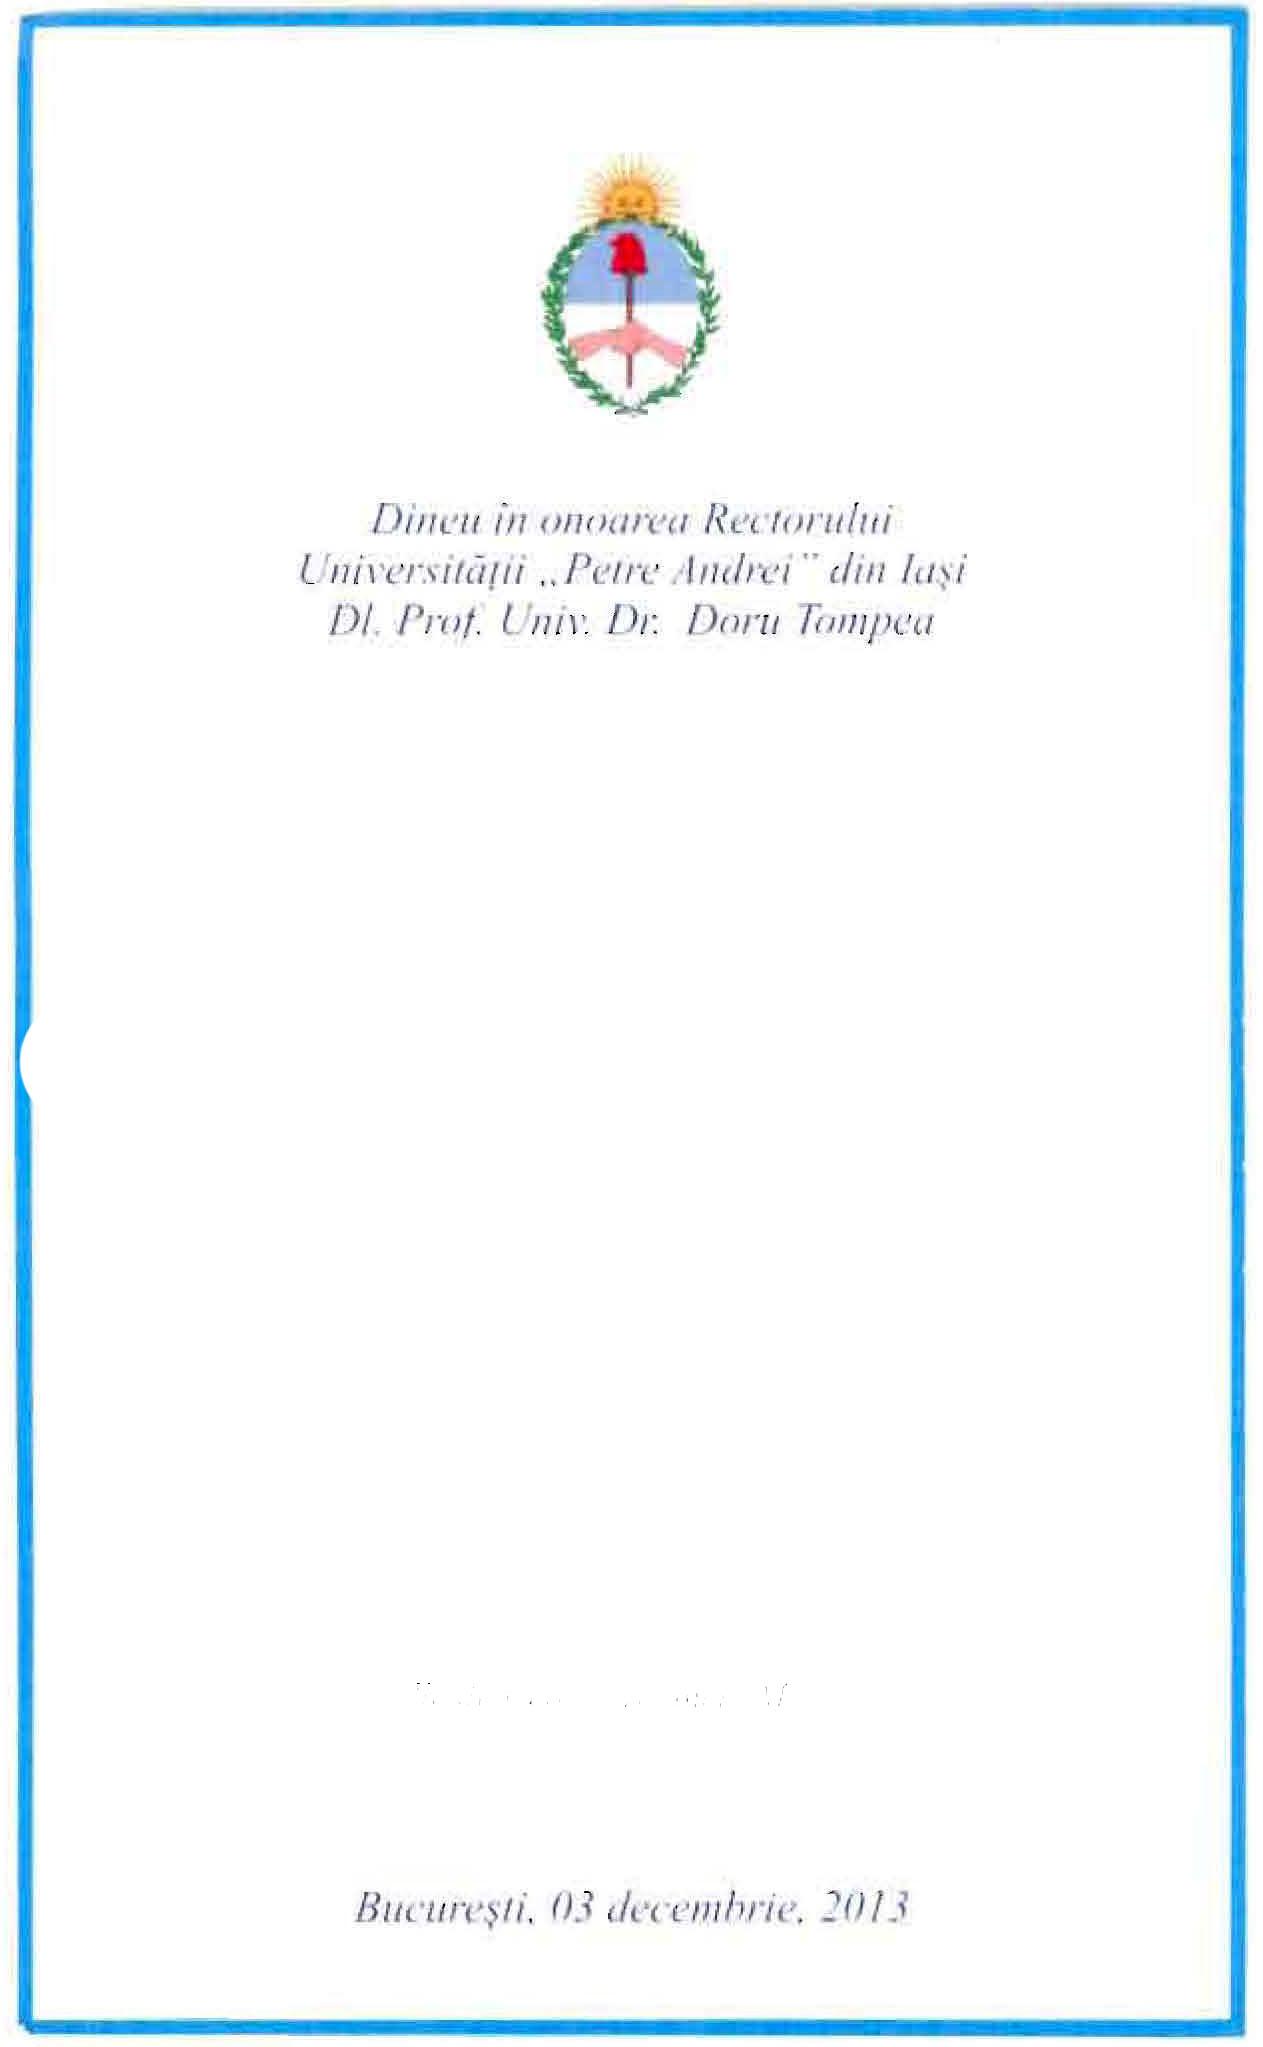 invitatie ambasada